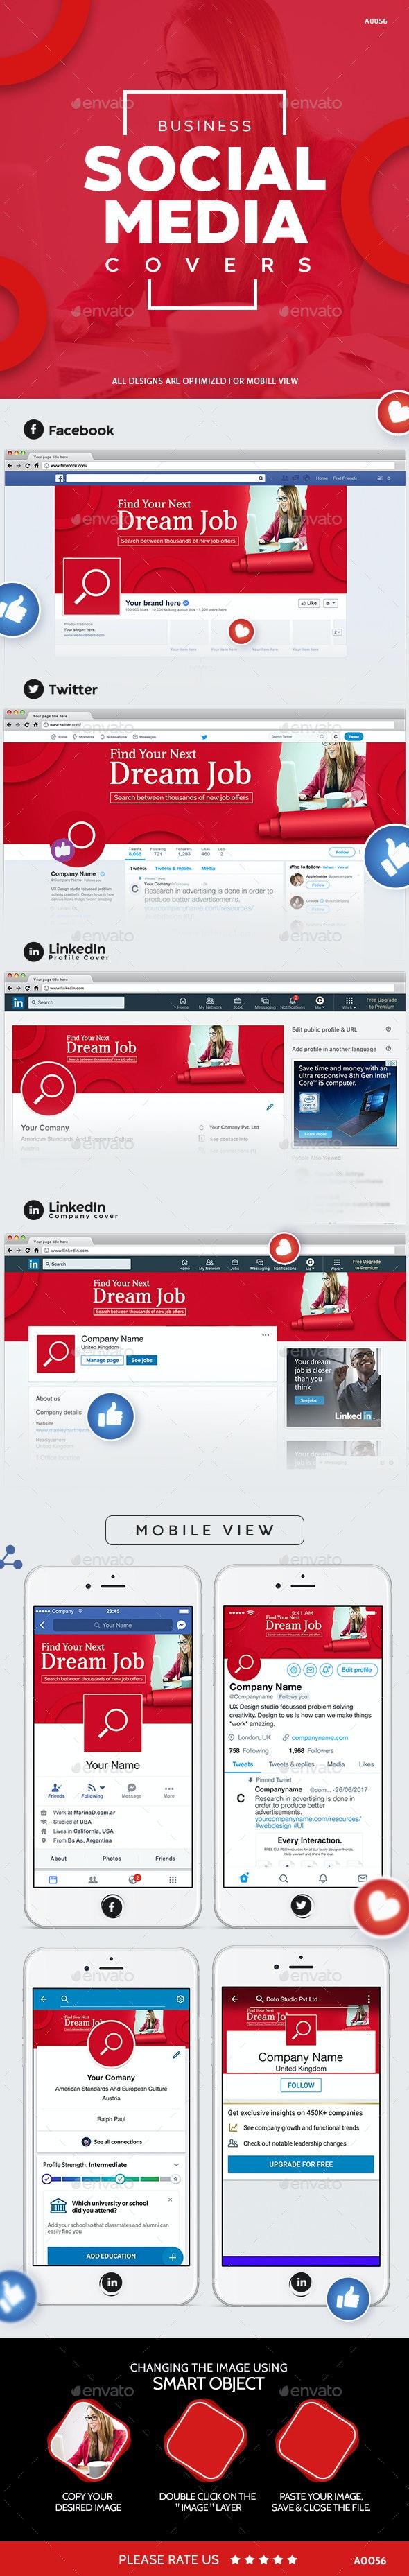 Business Social Media Cover Set - Miscellaneous Social Media